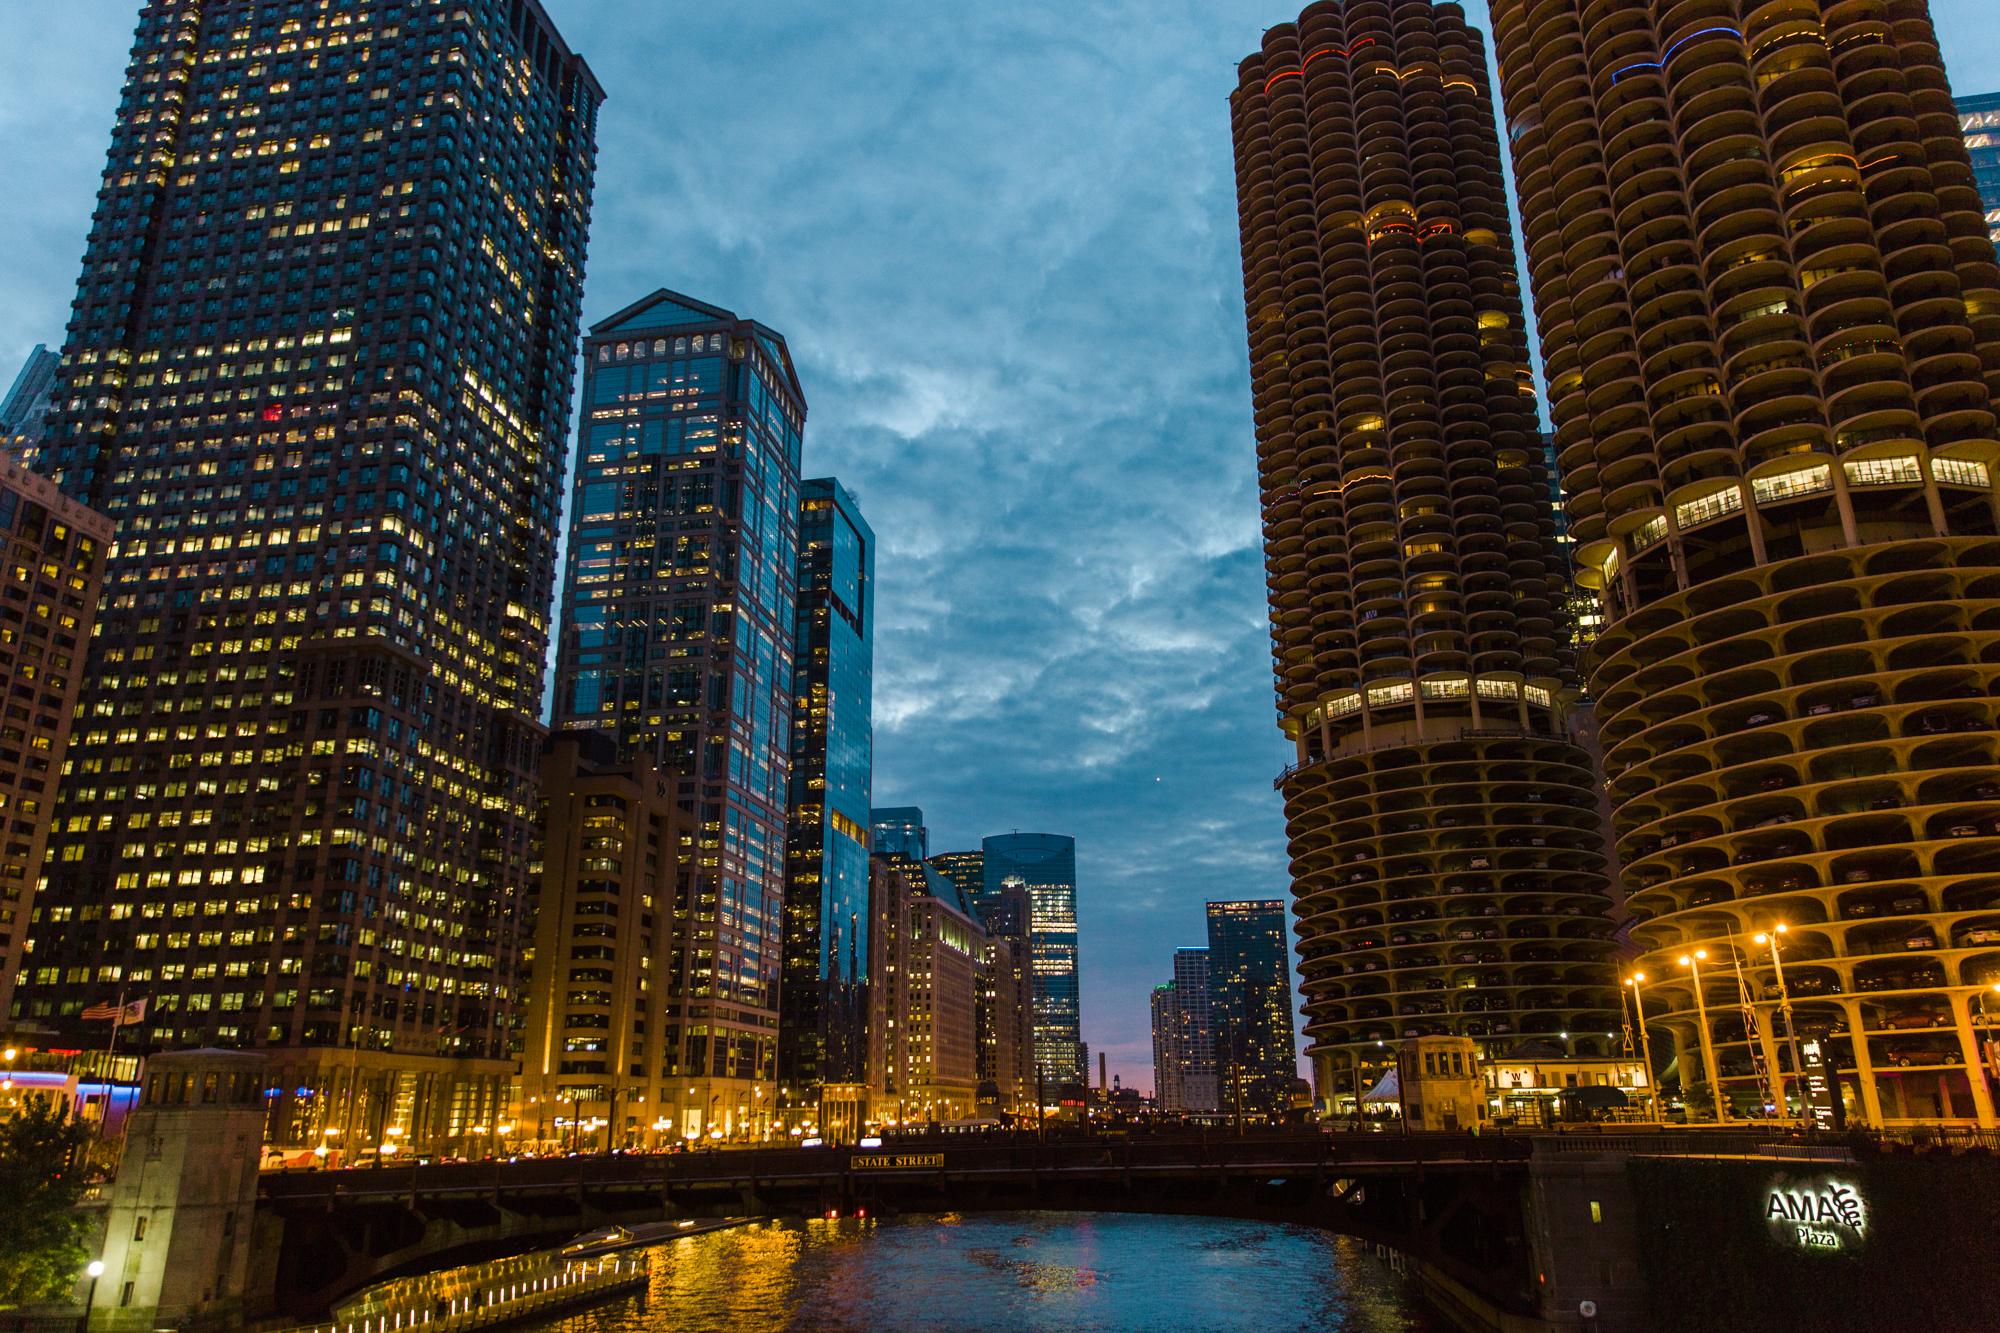 chicago-at-night-blog-106